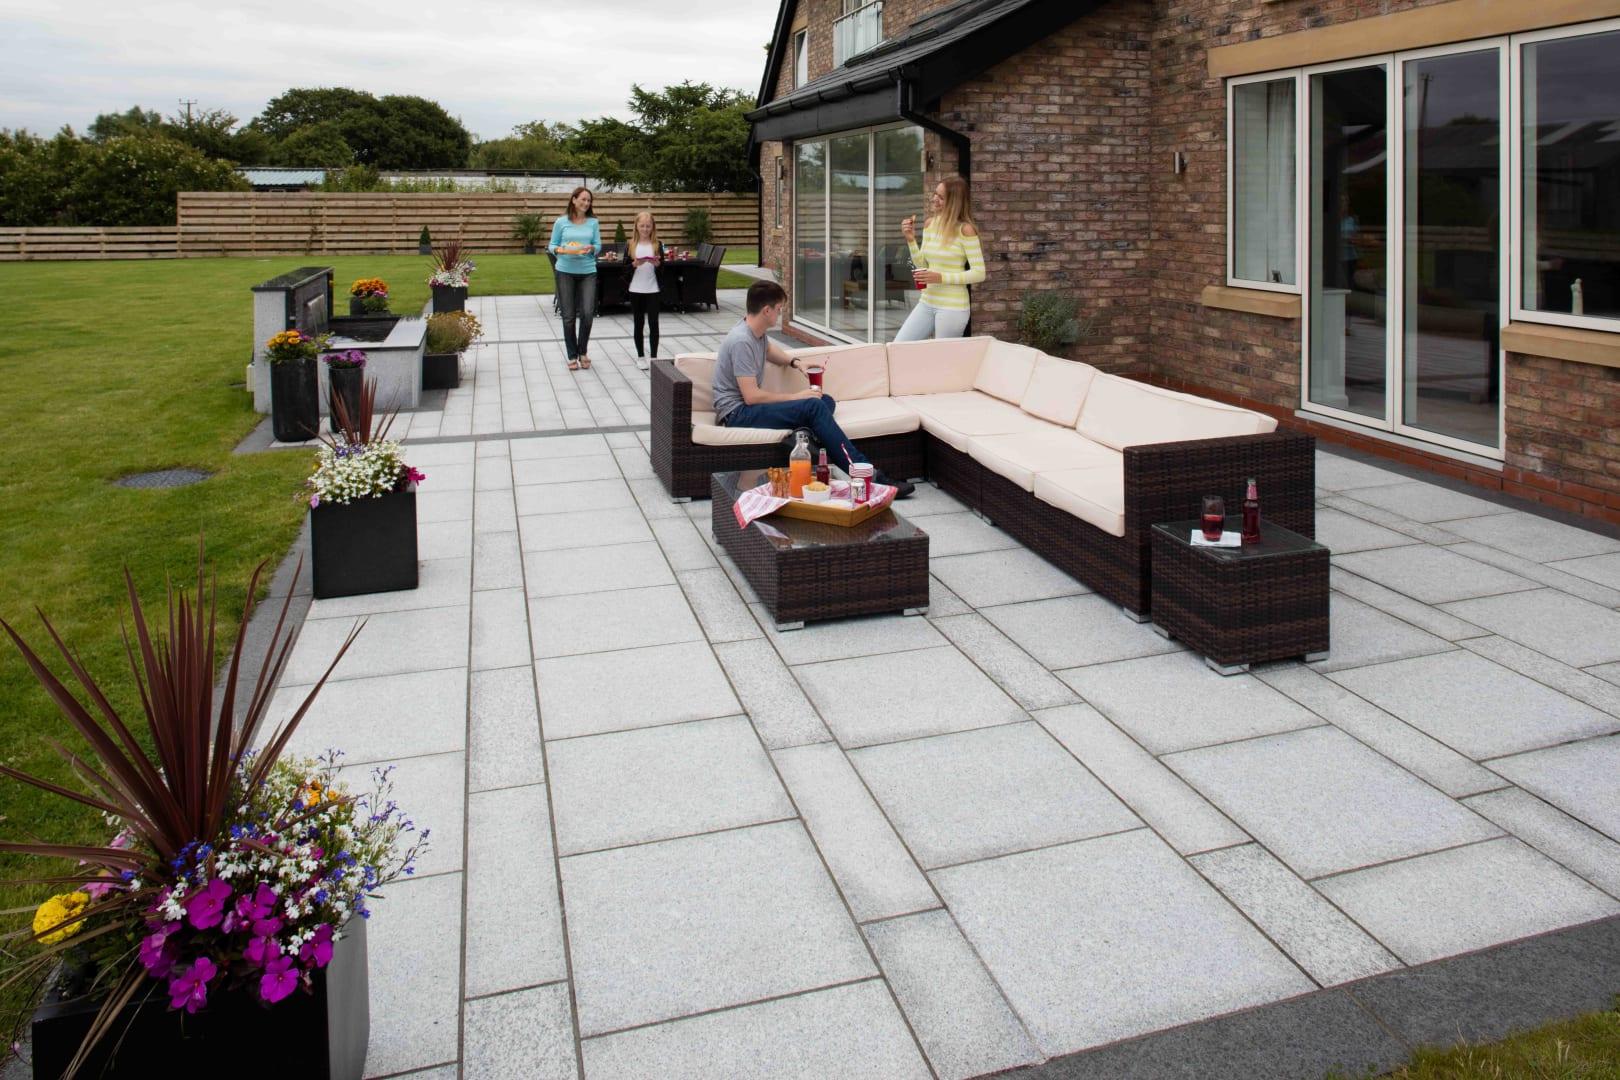 Eye-catching-paving-1 100+ Surprising Garden Design Ideas You Should Not Miss in 2021